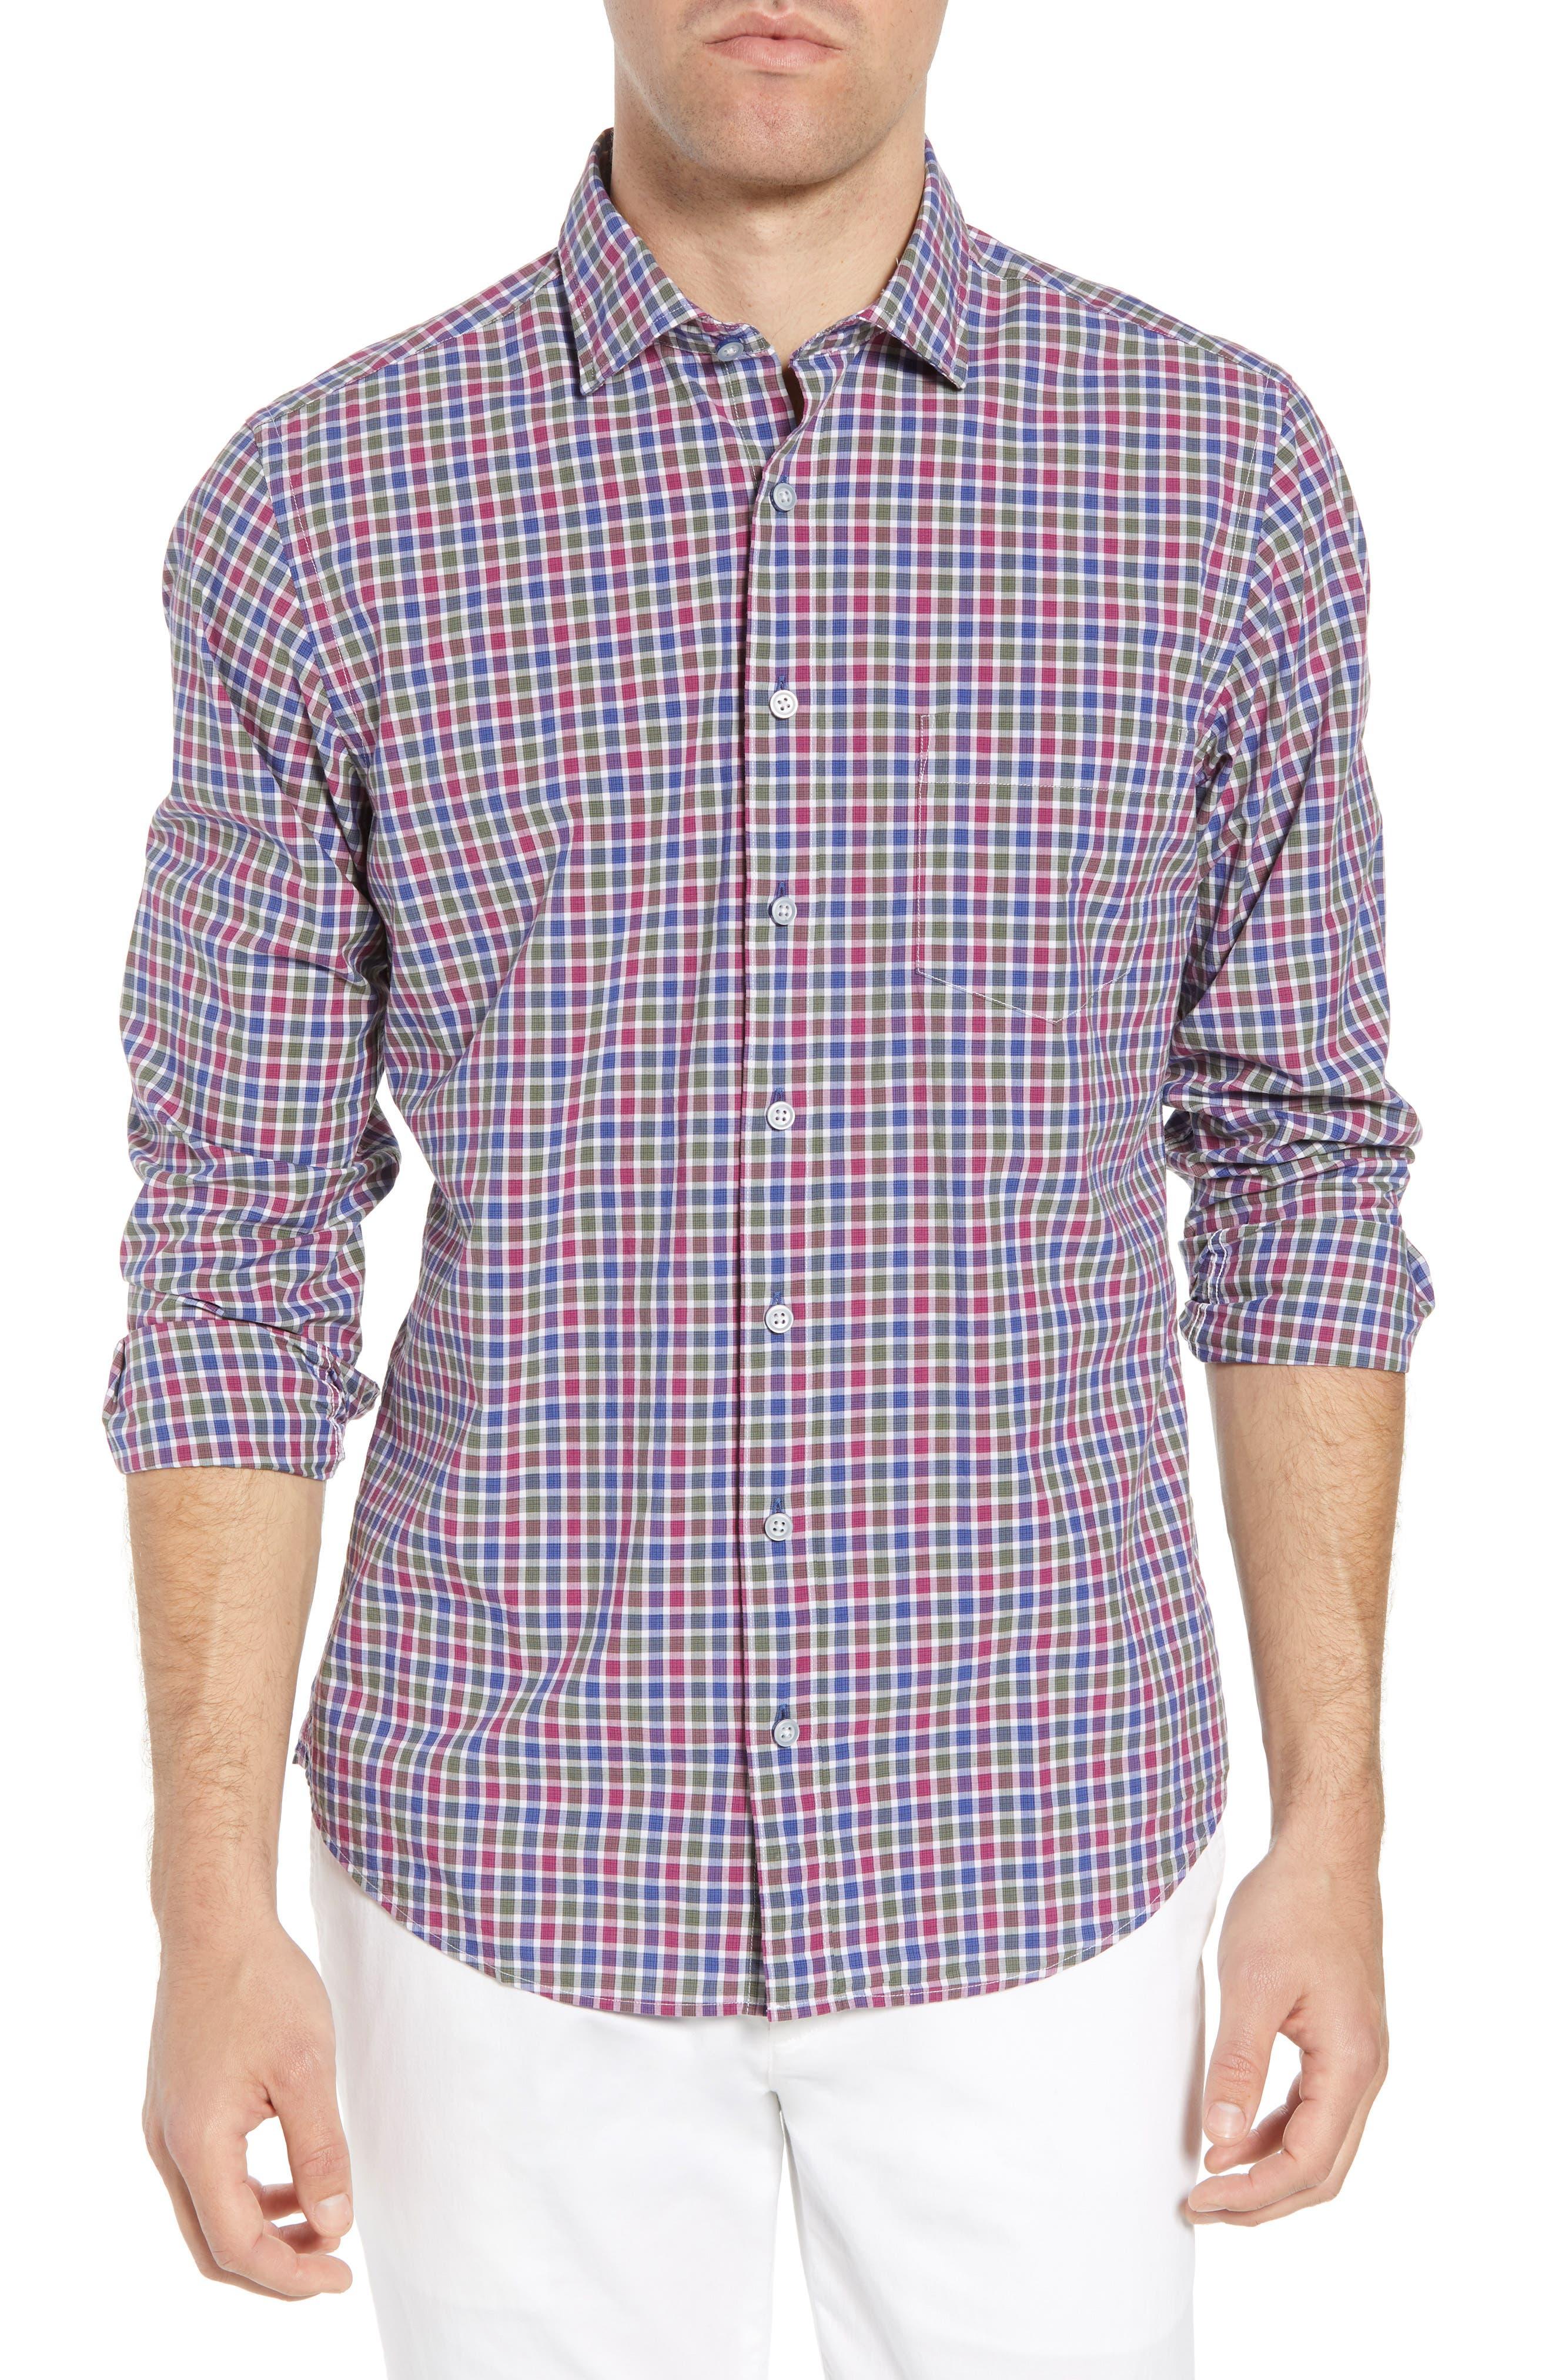 Alternate Image 1 Selected - Rodd & Gunn Macreas Flat Regular Fit Sport Shirt